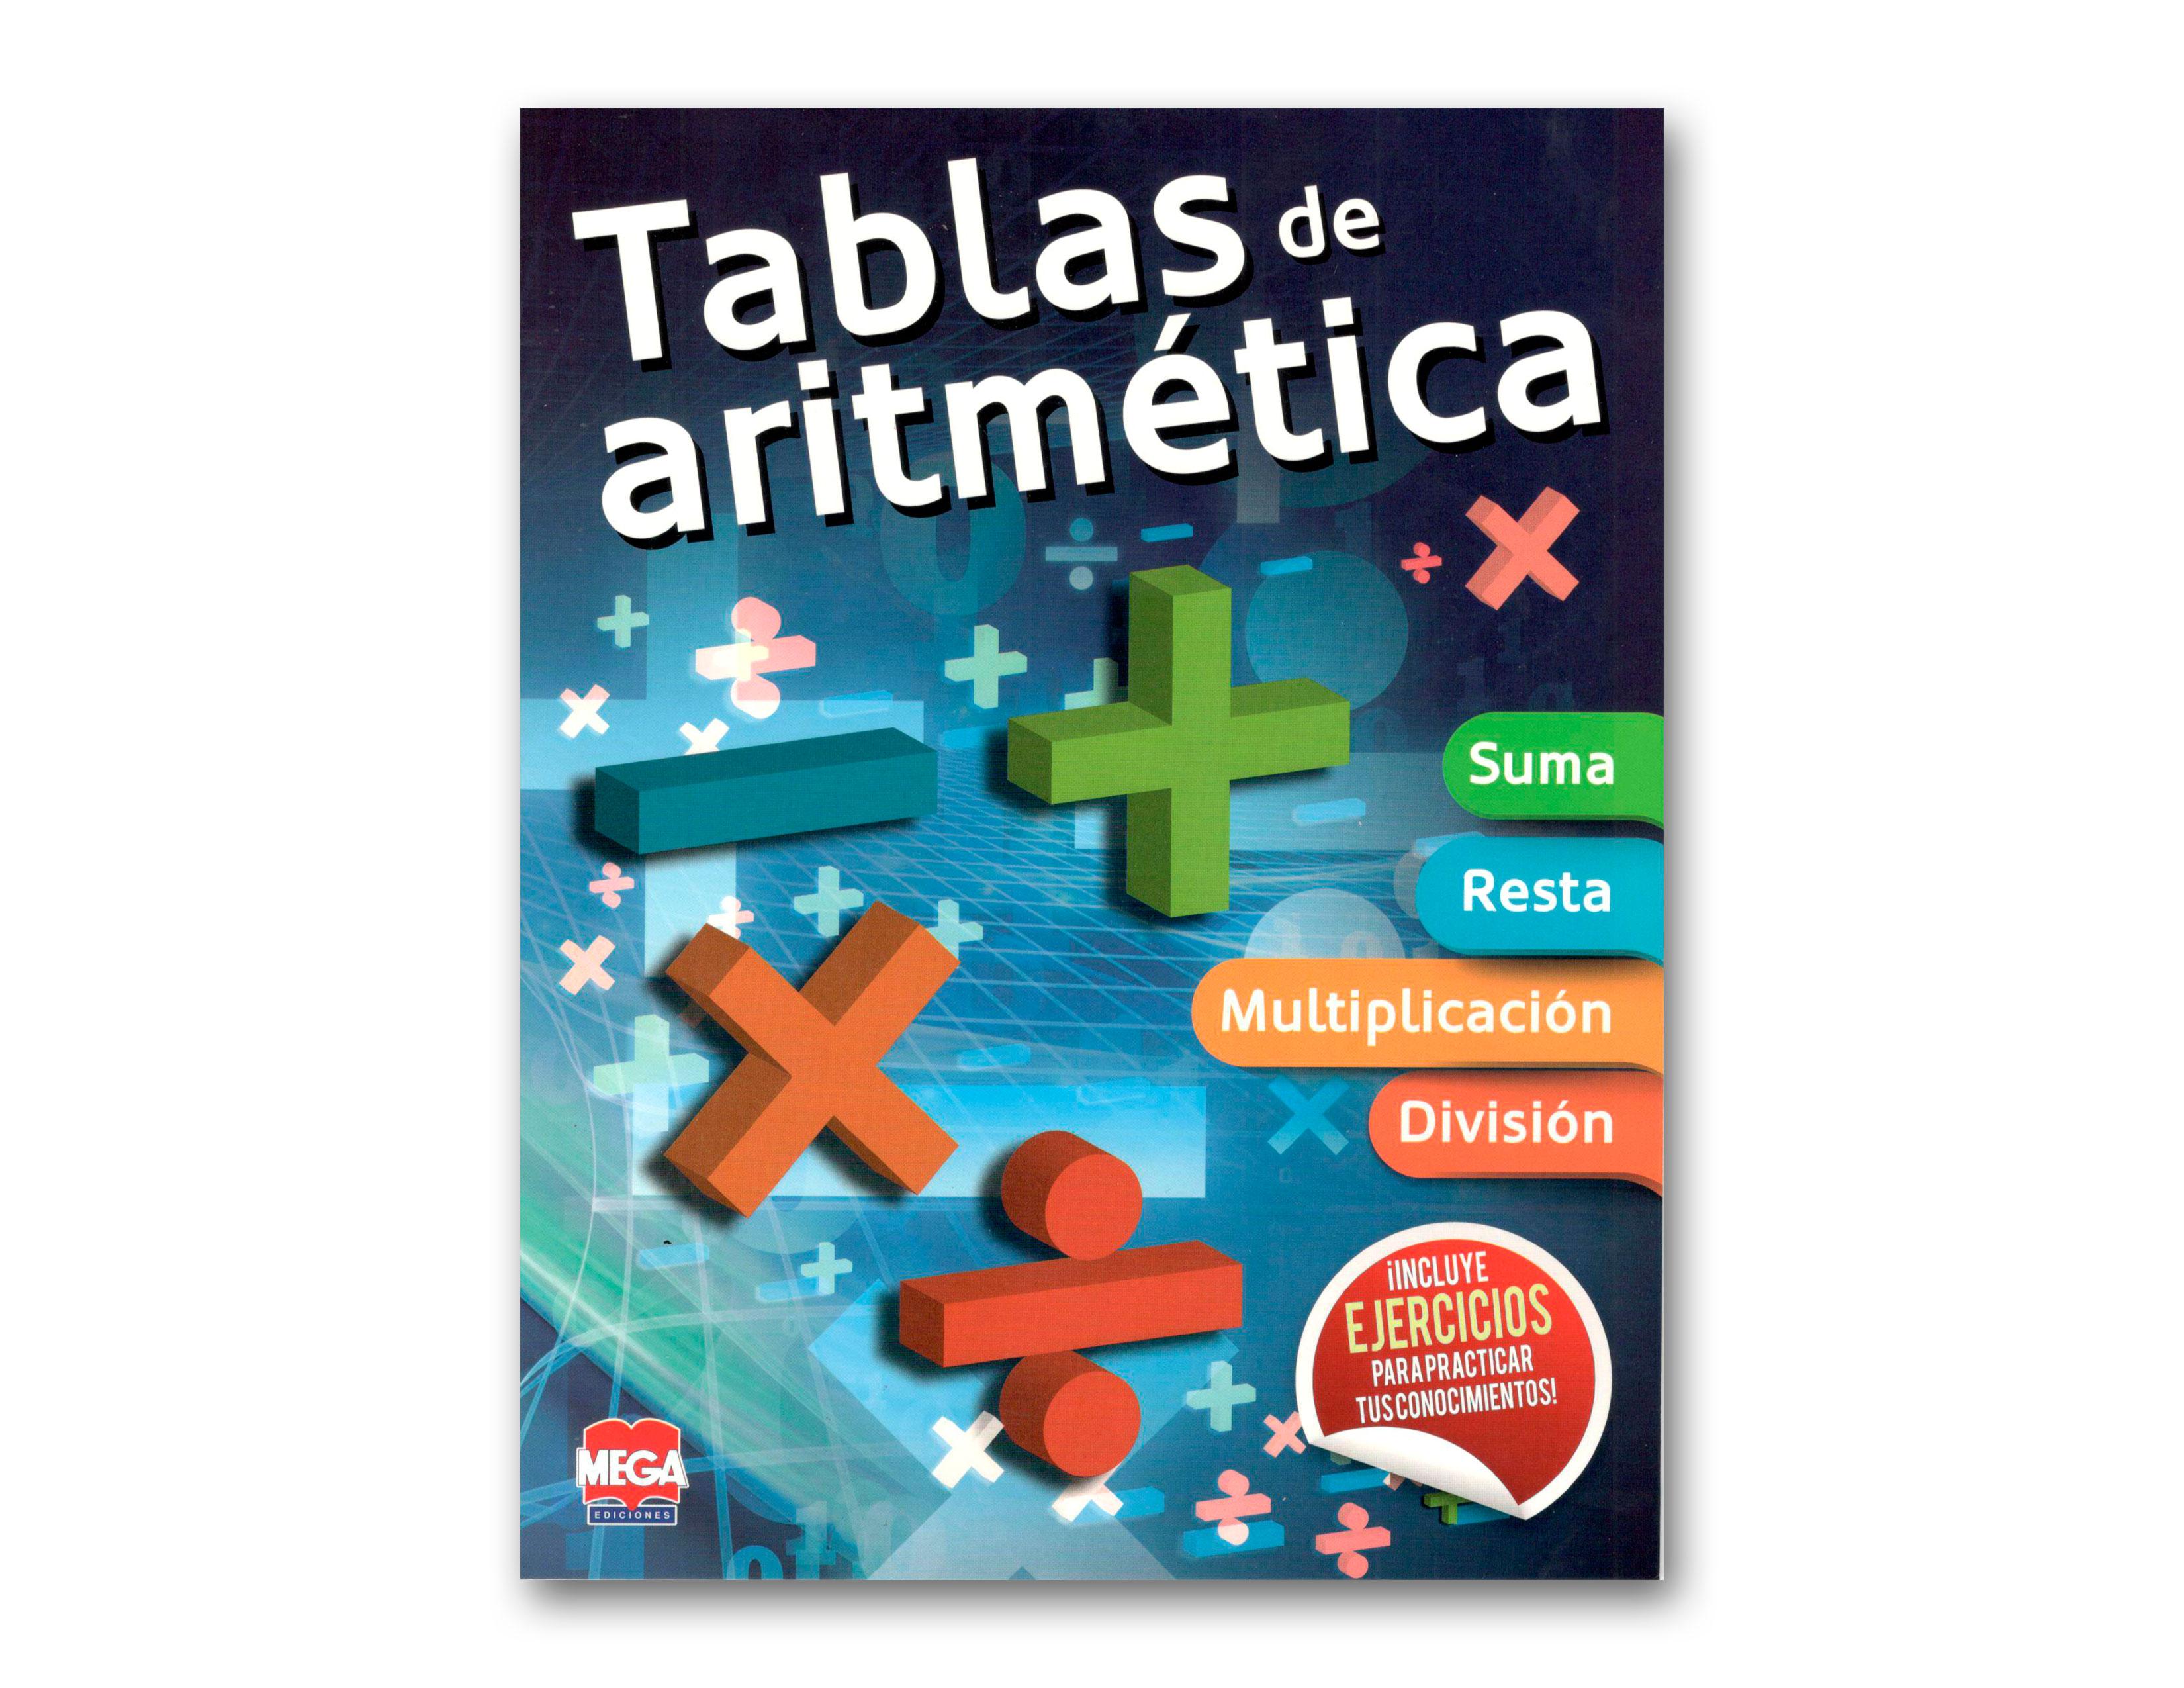 TABLAS DE ARITMETICA 1117